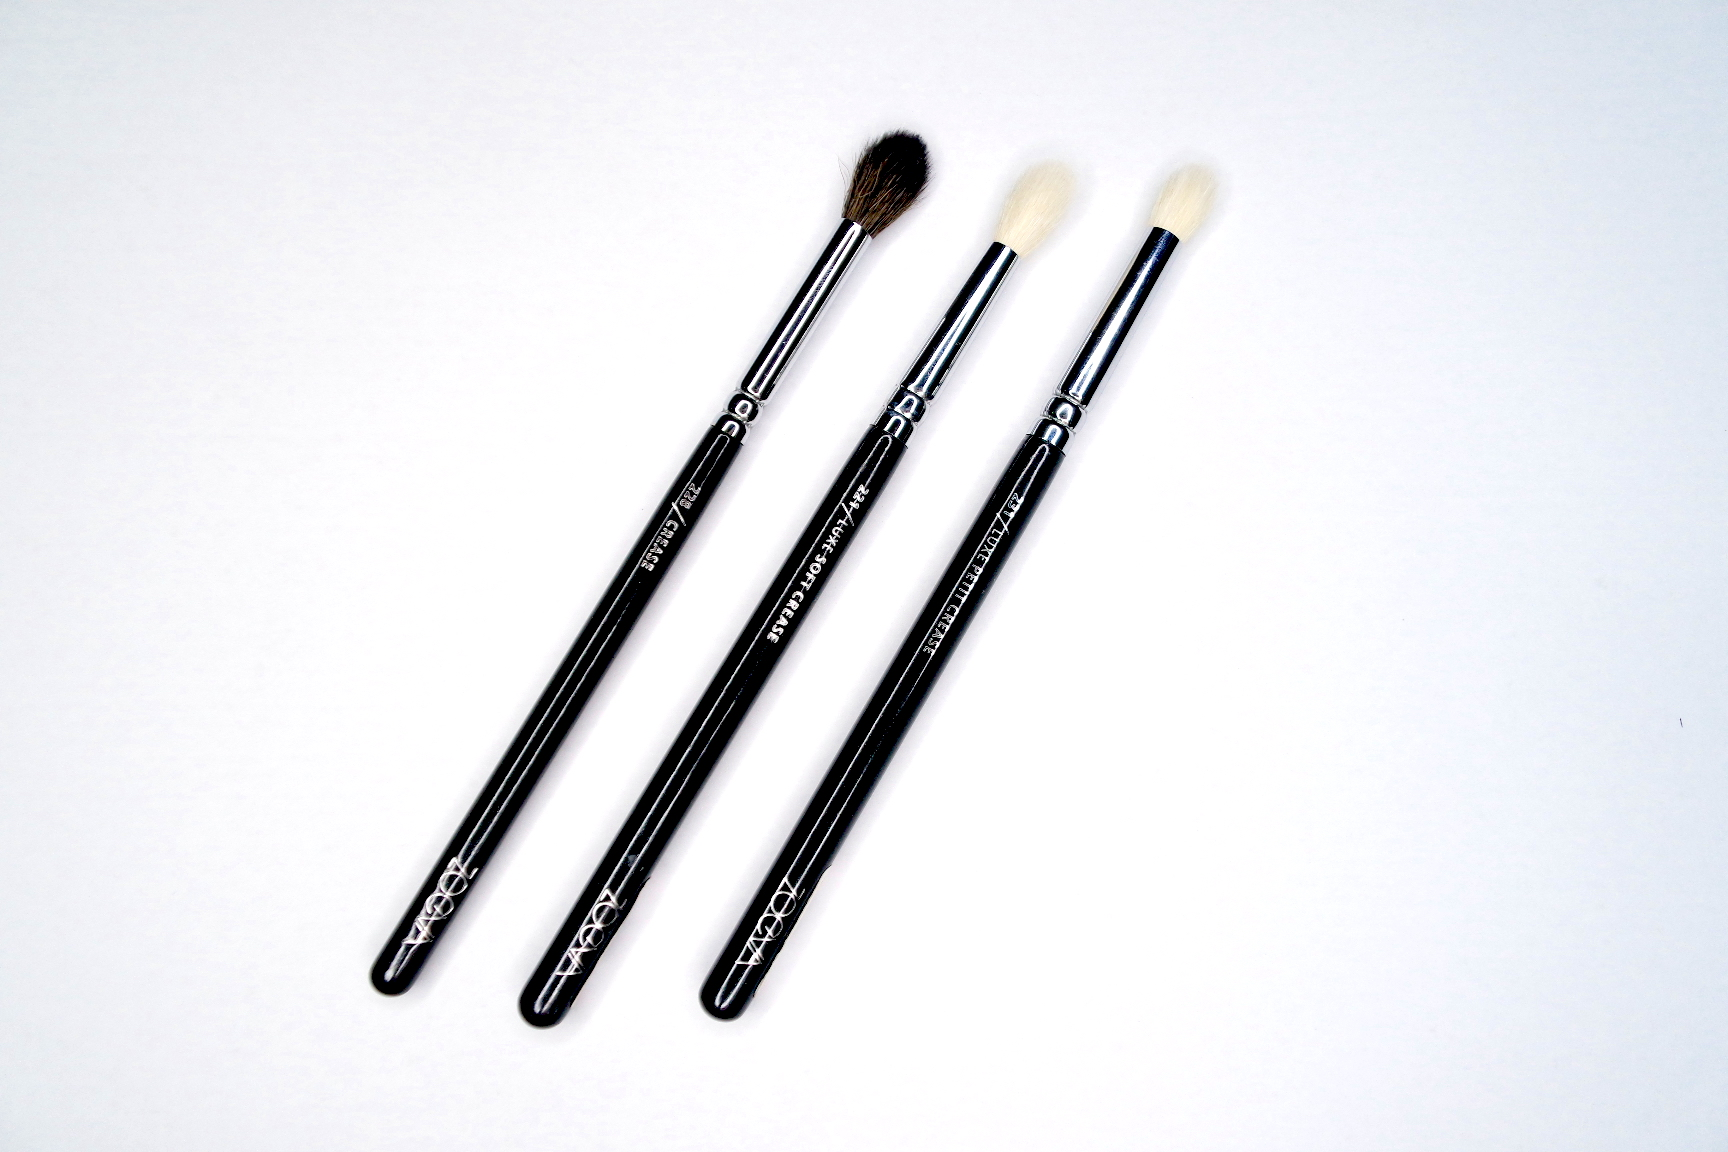 zoeva 228 luxe crease brush, 221 luxe soft crease brush, 231 luxe petit crease brush